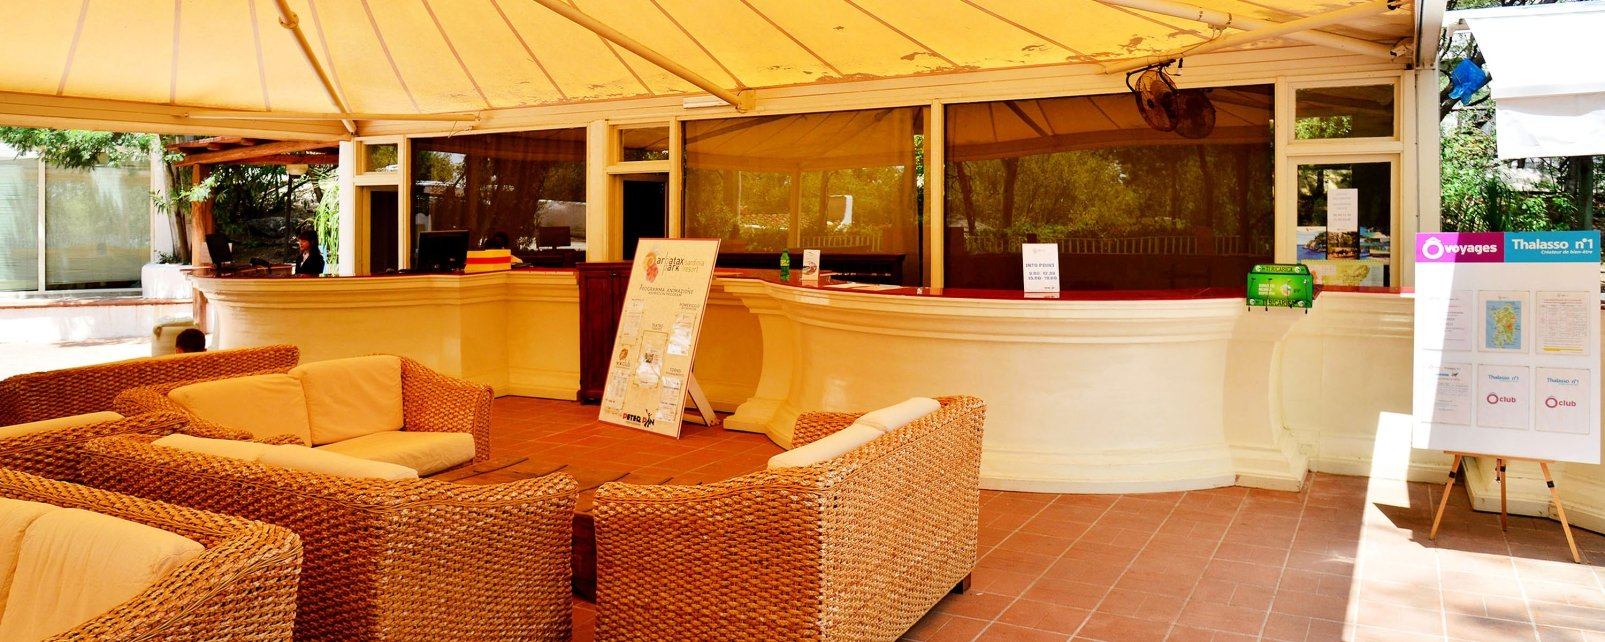 Ôclub Arbatax Park Resort 4